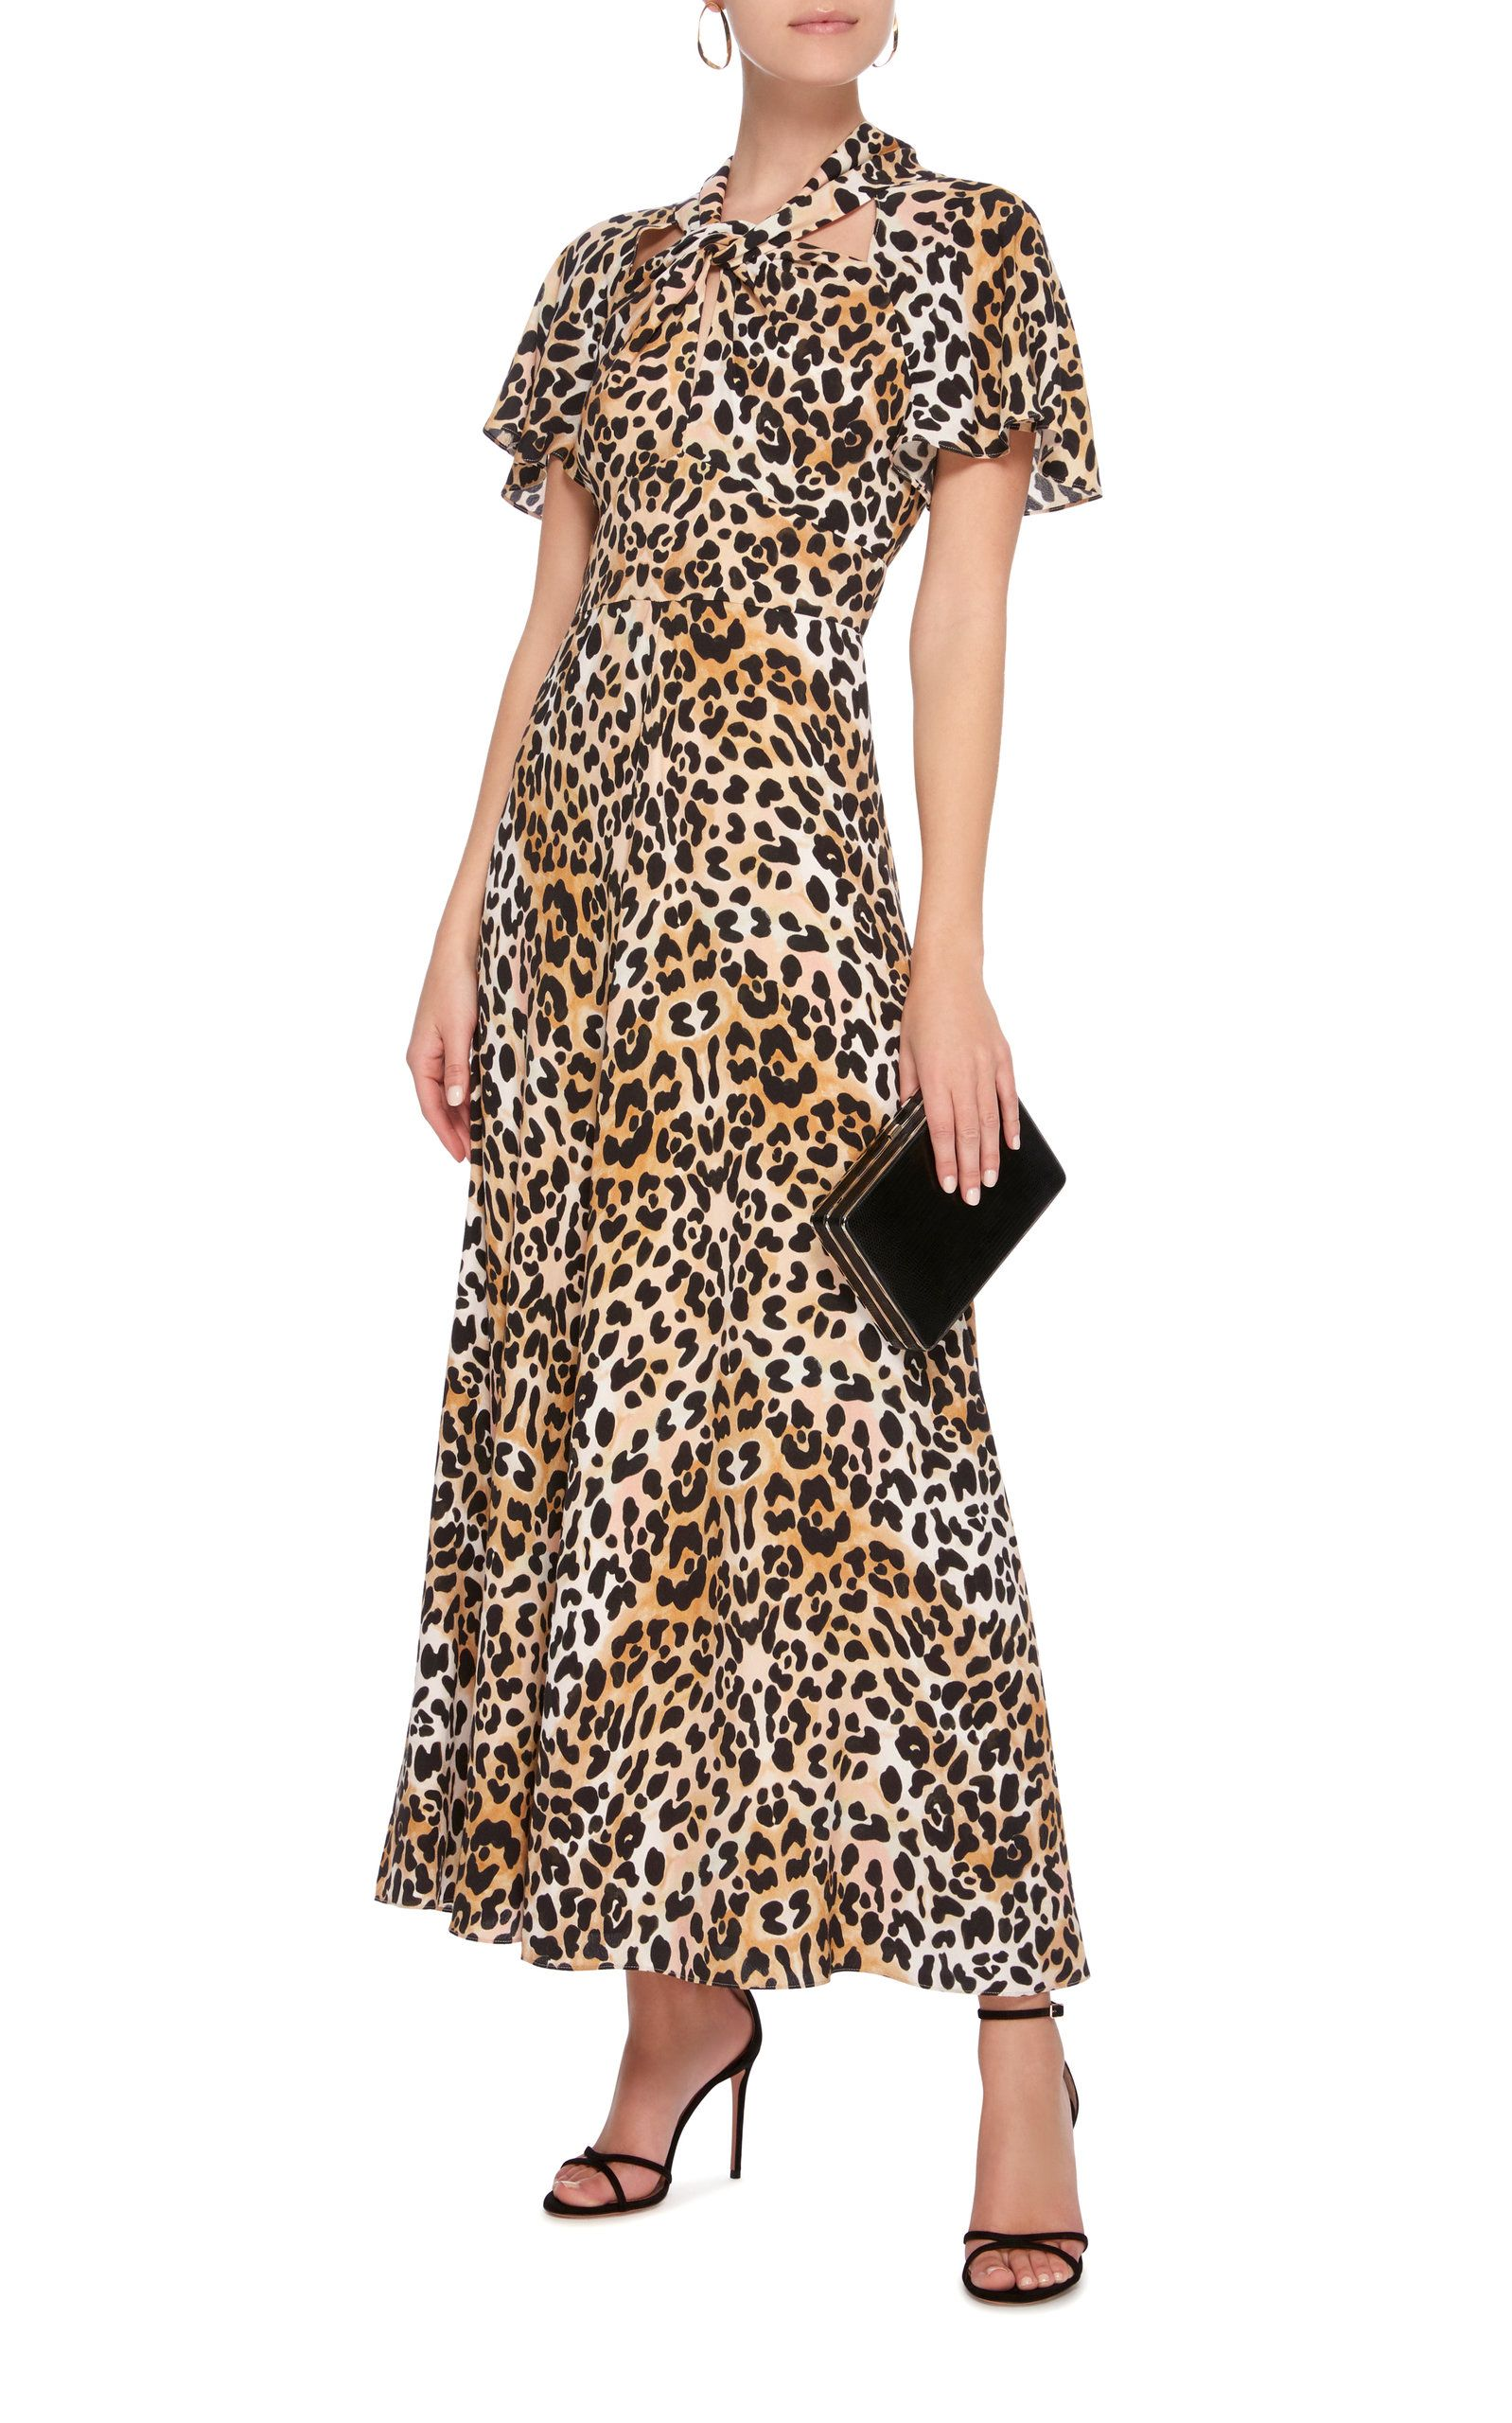 6aa58ee866 Wild Cat Midi Dress   Spring Dresses   Dresses, Dress outfits, Temperley